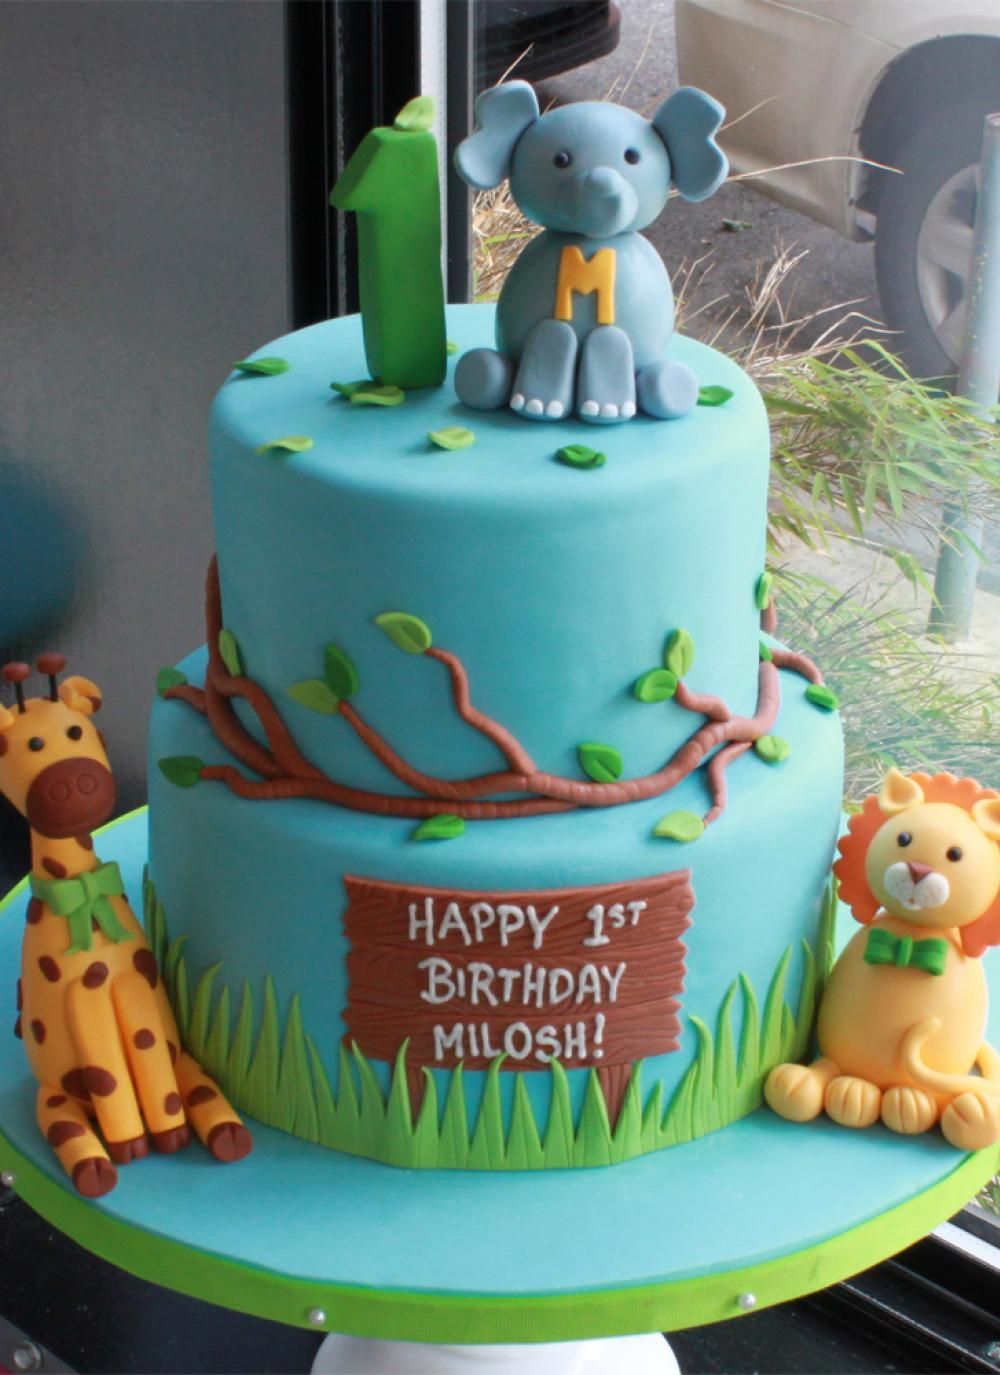 Whipped Bakeshop Philadelphia Safari Animals Birthday Cake 1st